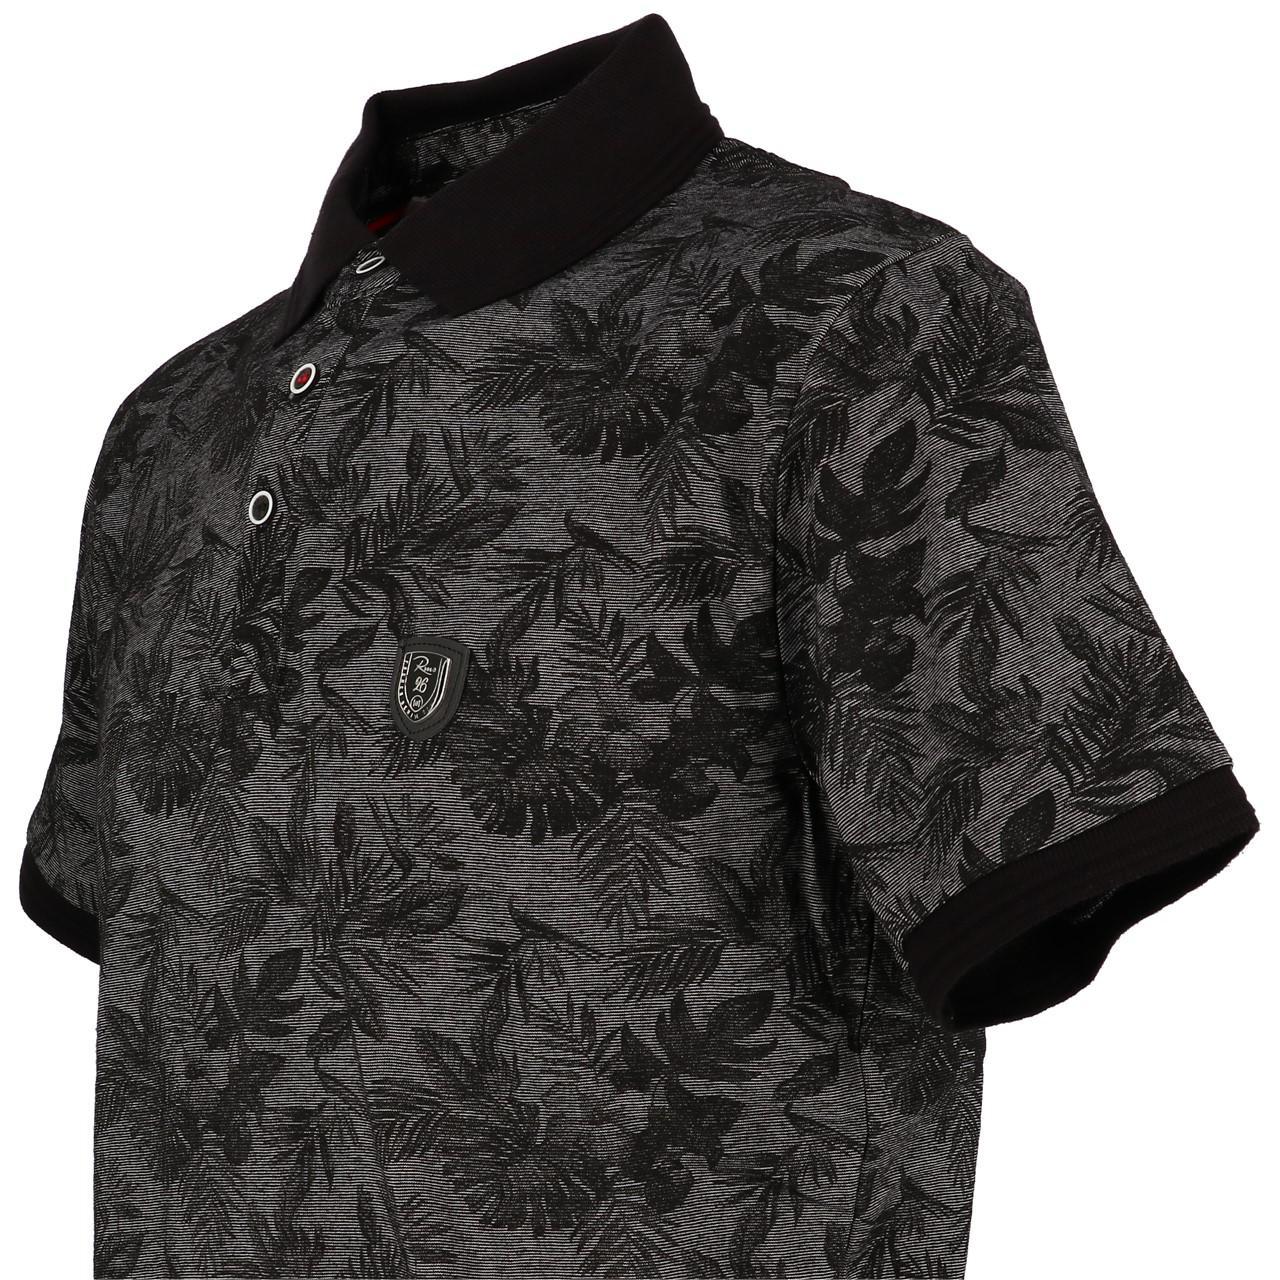 Short-Sleeve-Polo-RMS-26-Tropical-Black-Mc-Polo-Black-90730-New thumbnail 3